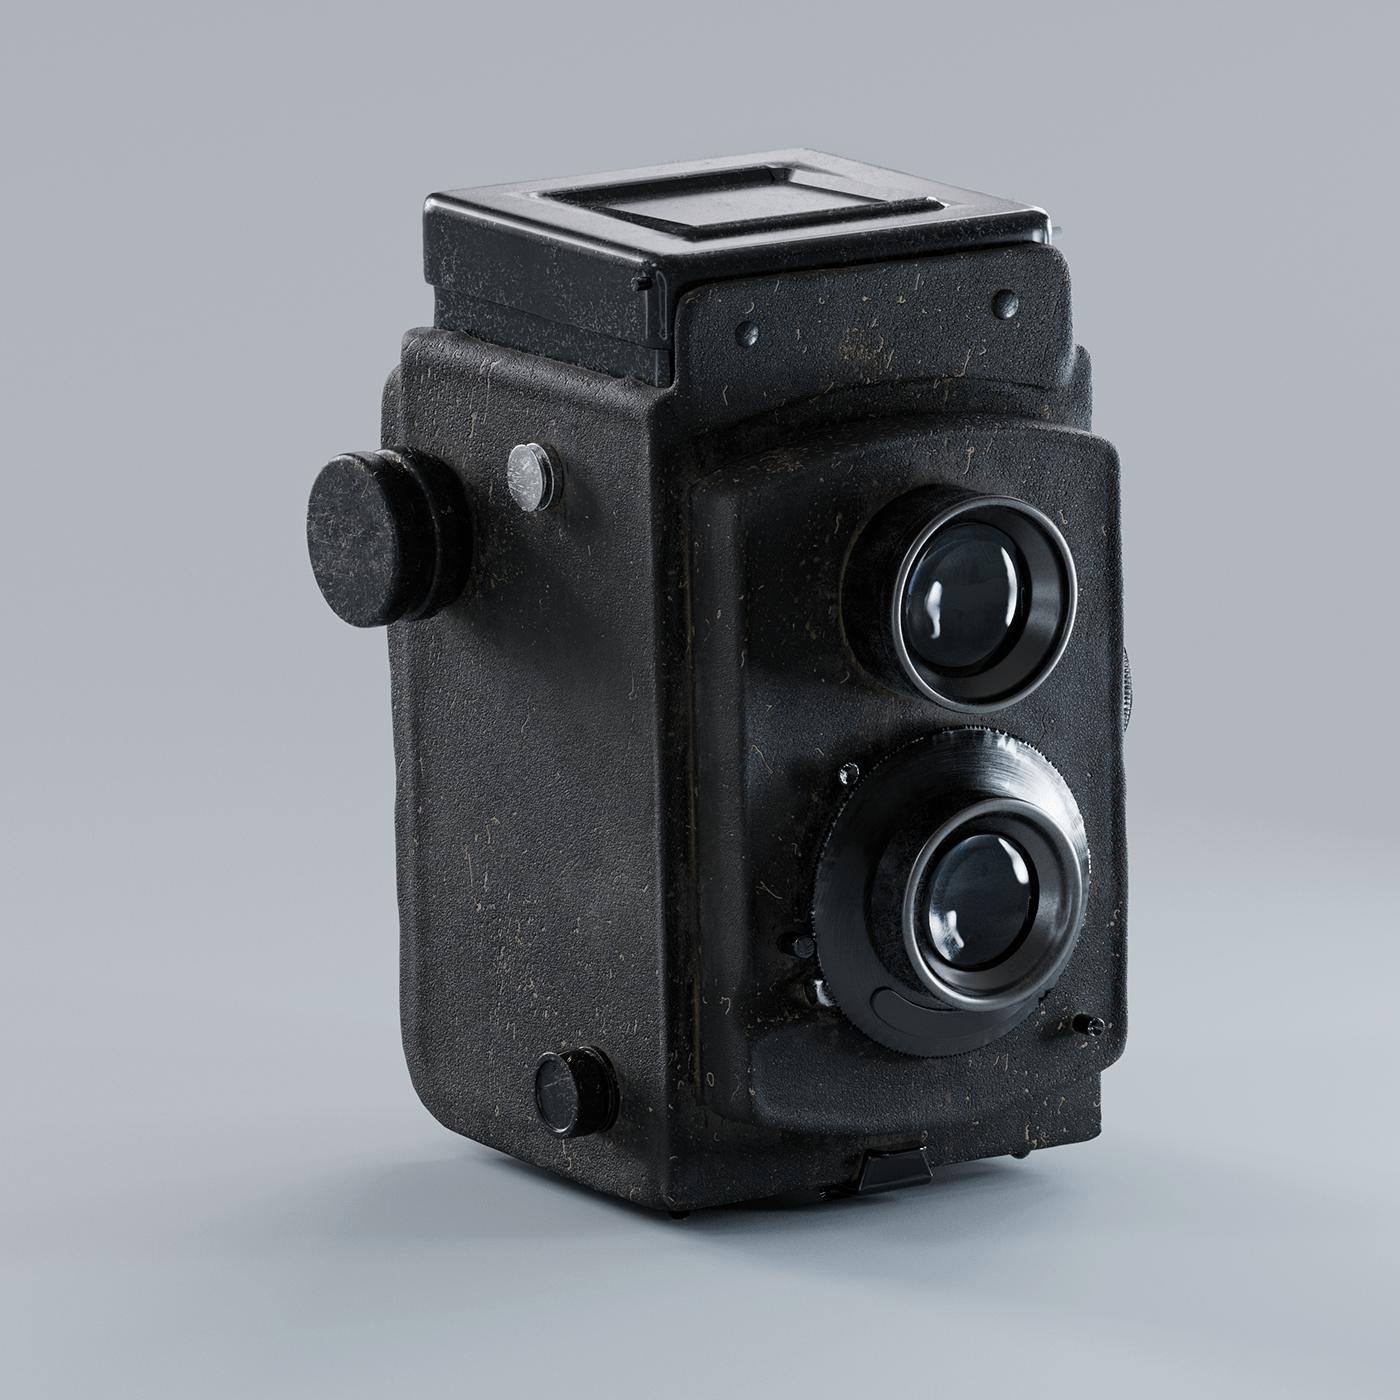 Image may contain: camera, electronics and cameras & optics